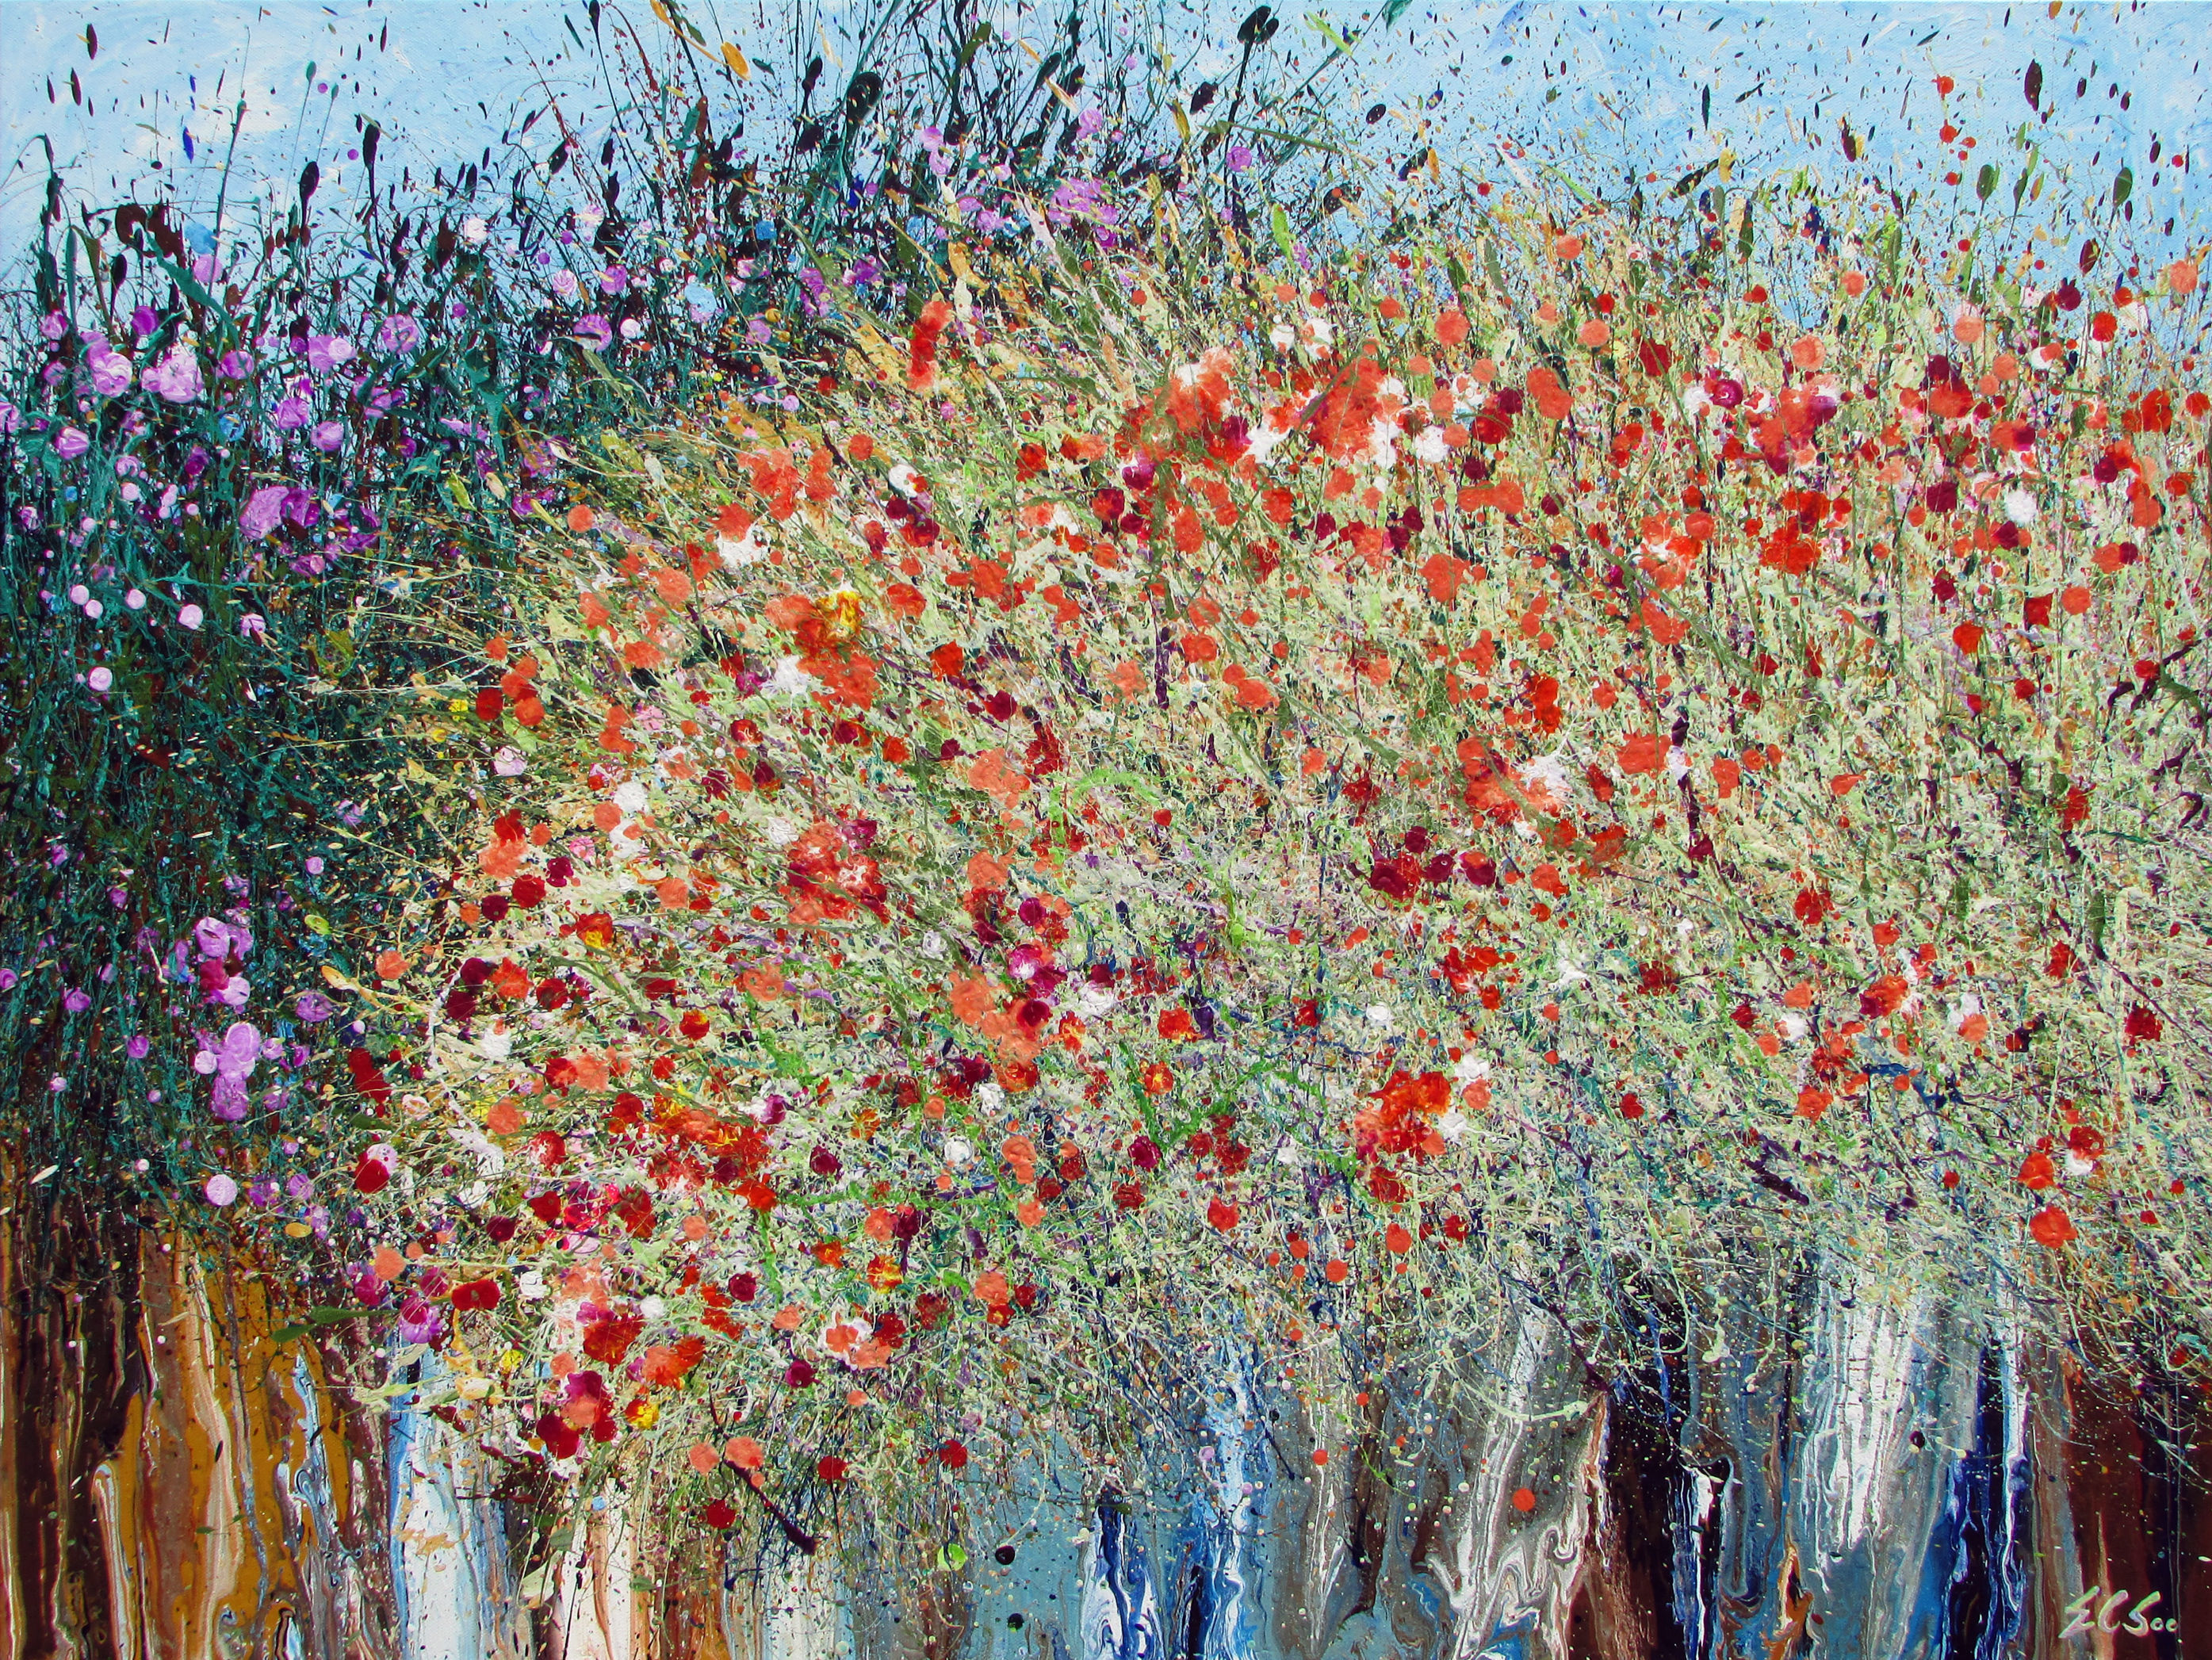 12 desert wildflowers 28 30x40 slp89x